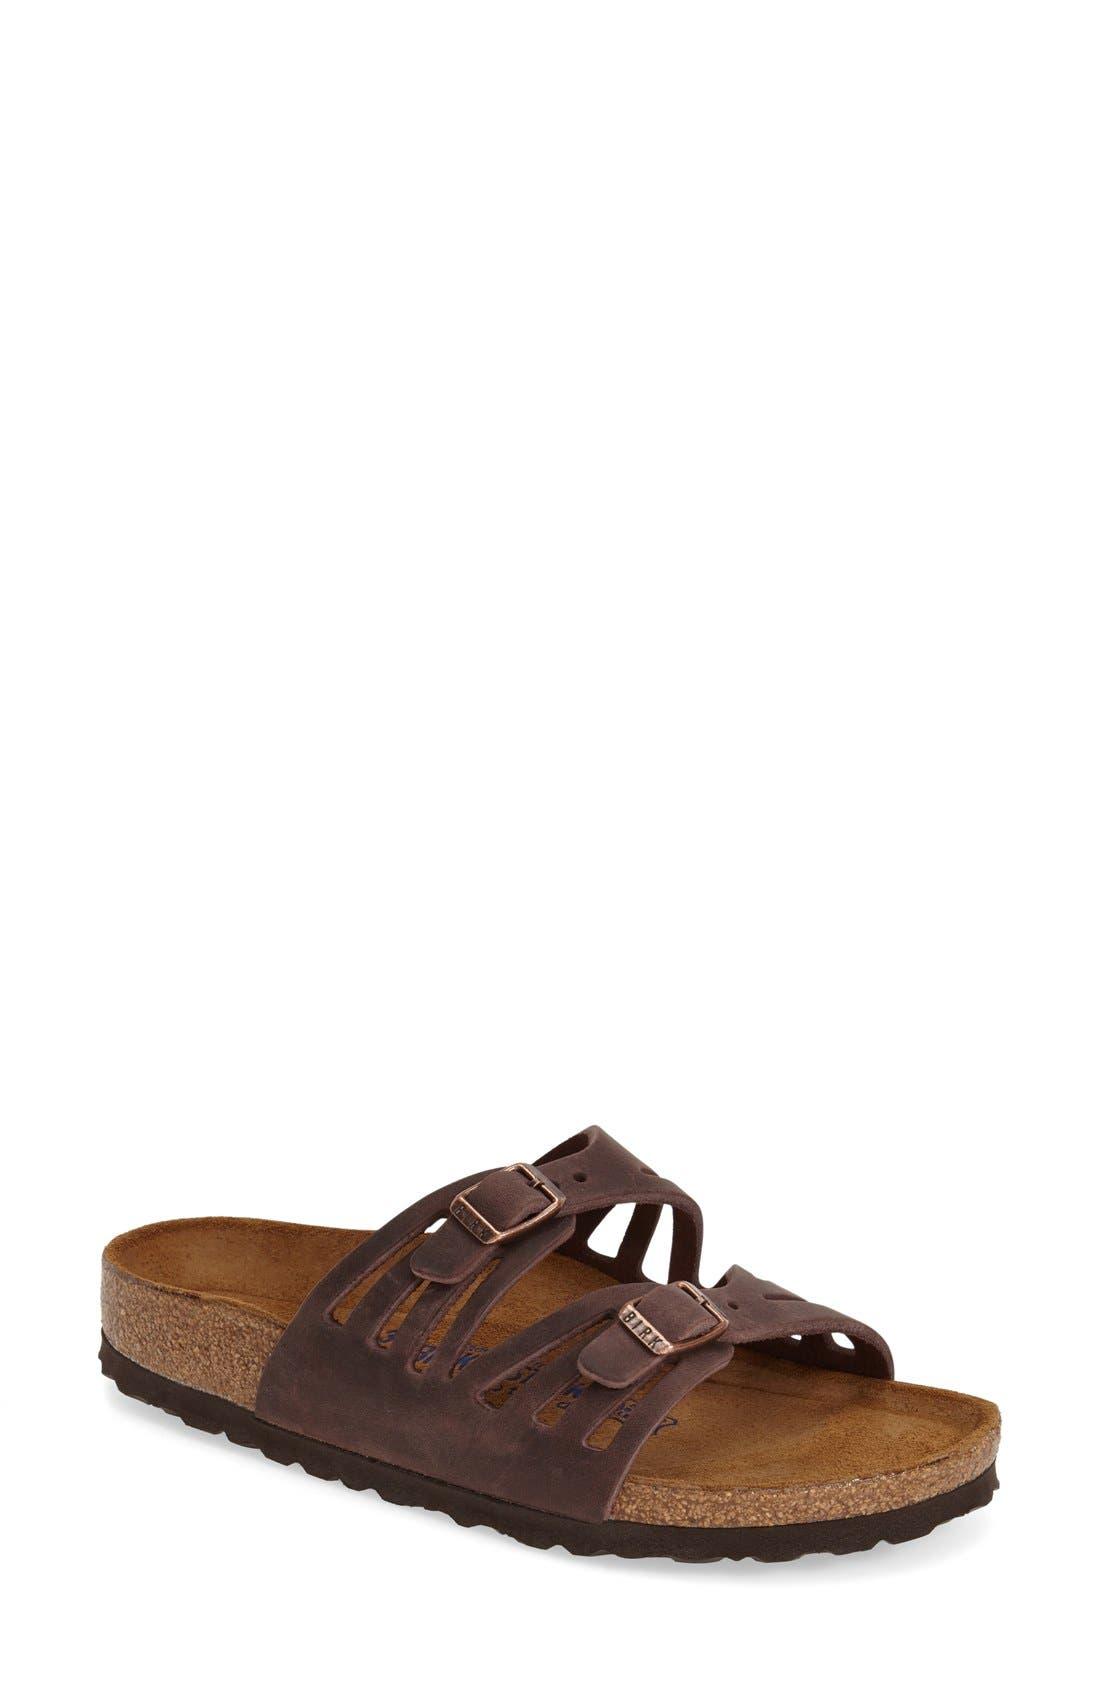 Birkenstock Granada Soft Footbed Oiled Leather Sandal (Women)